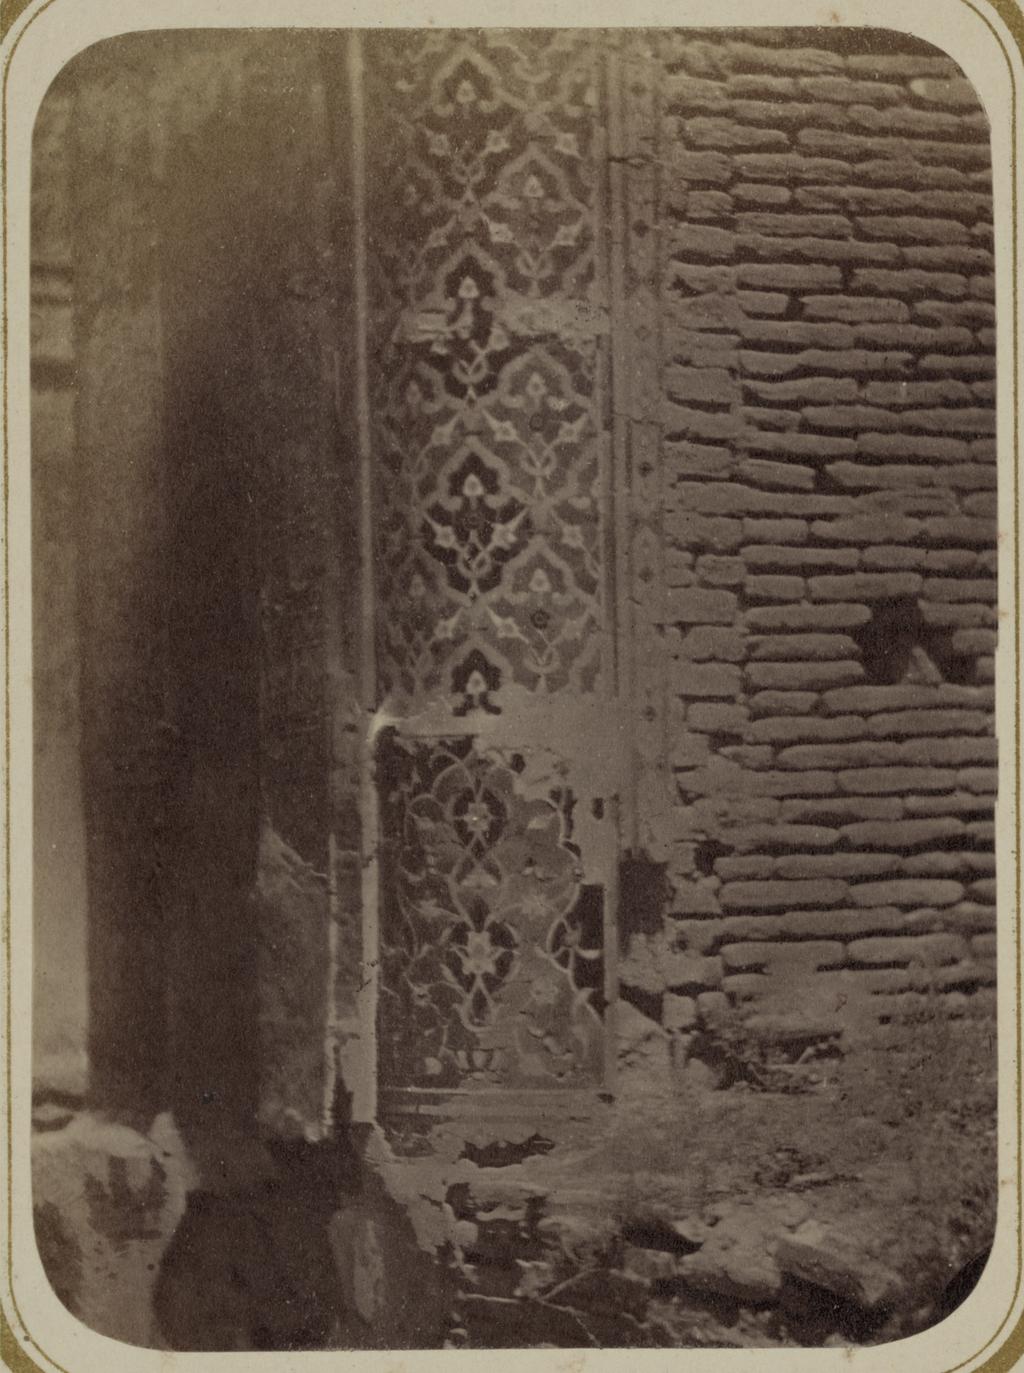 Мавзолей эмира Тимура Курагана (Гур-Эмир). Часть угловой колонны фасада